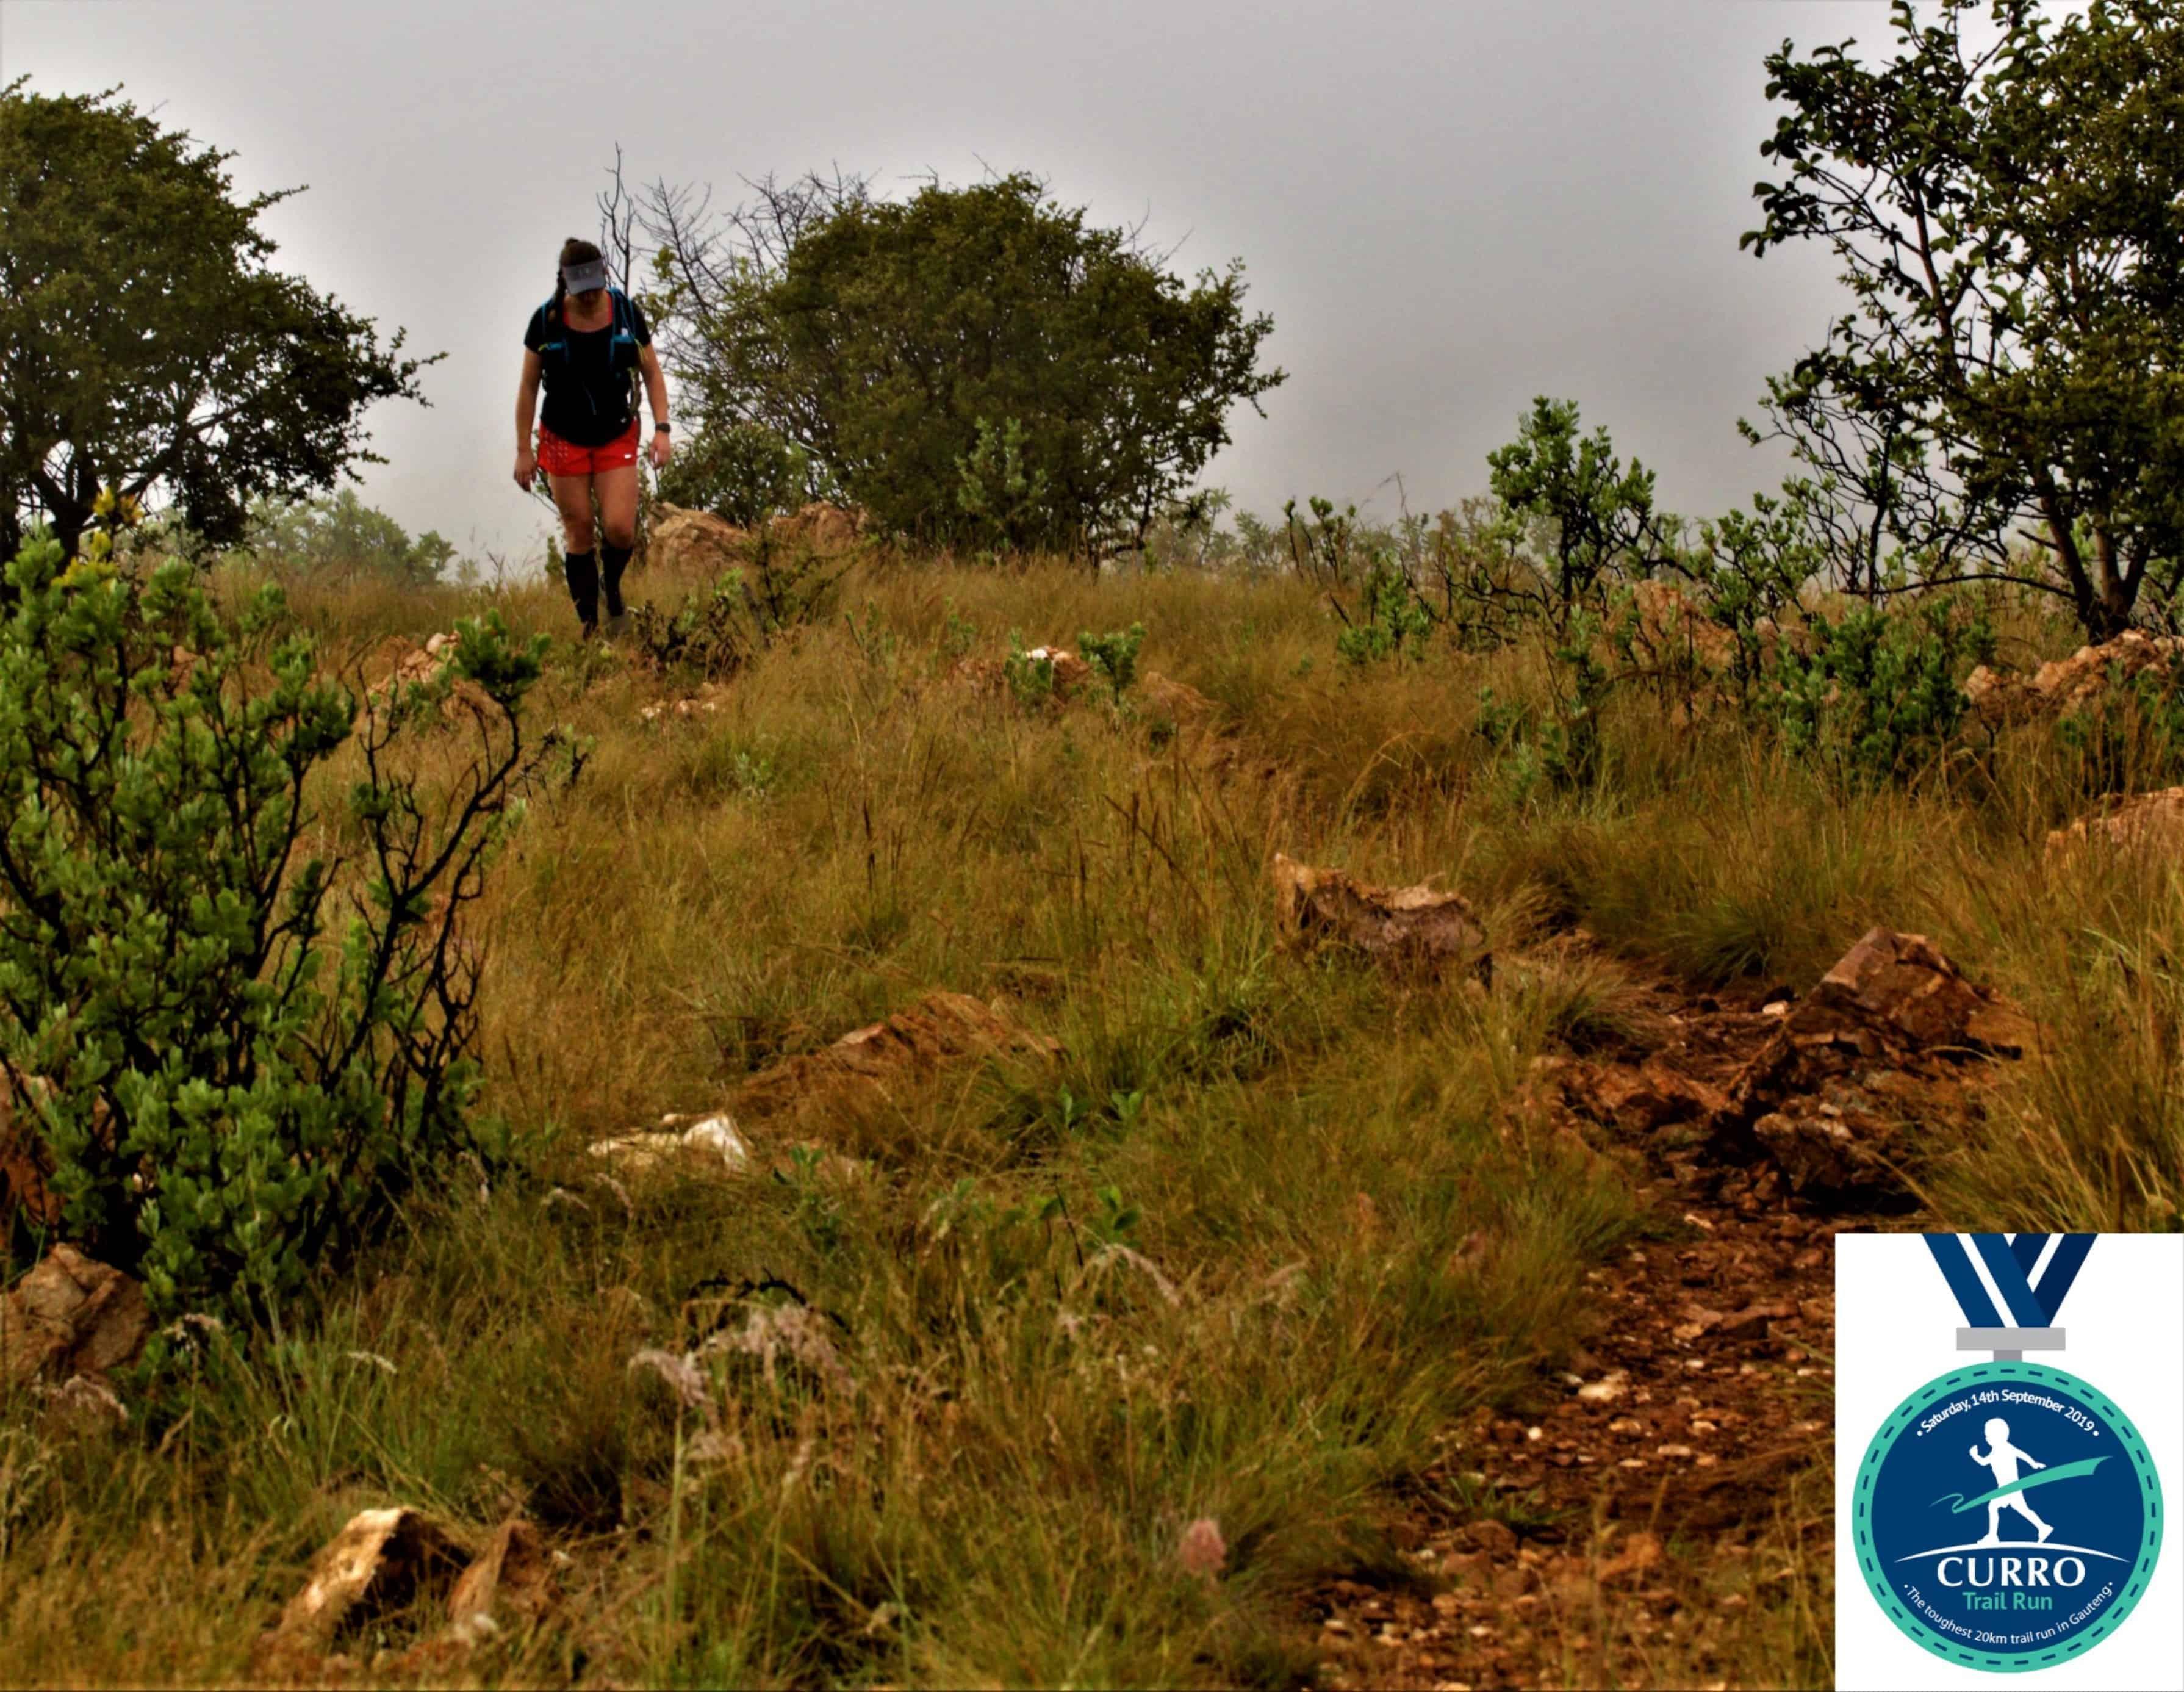 Curro Trail Run | Runner's World Race Calendar